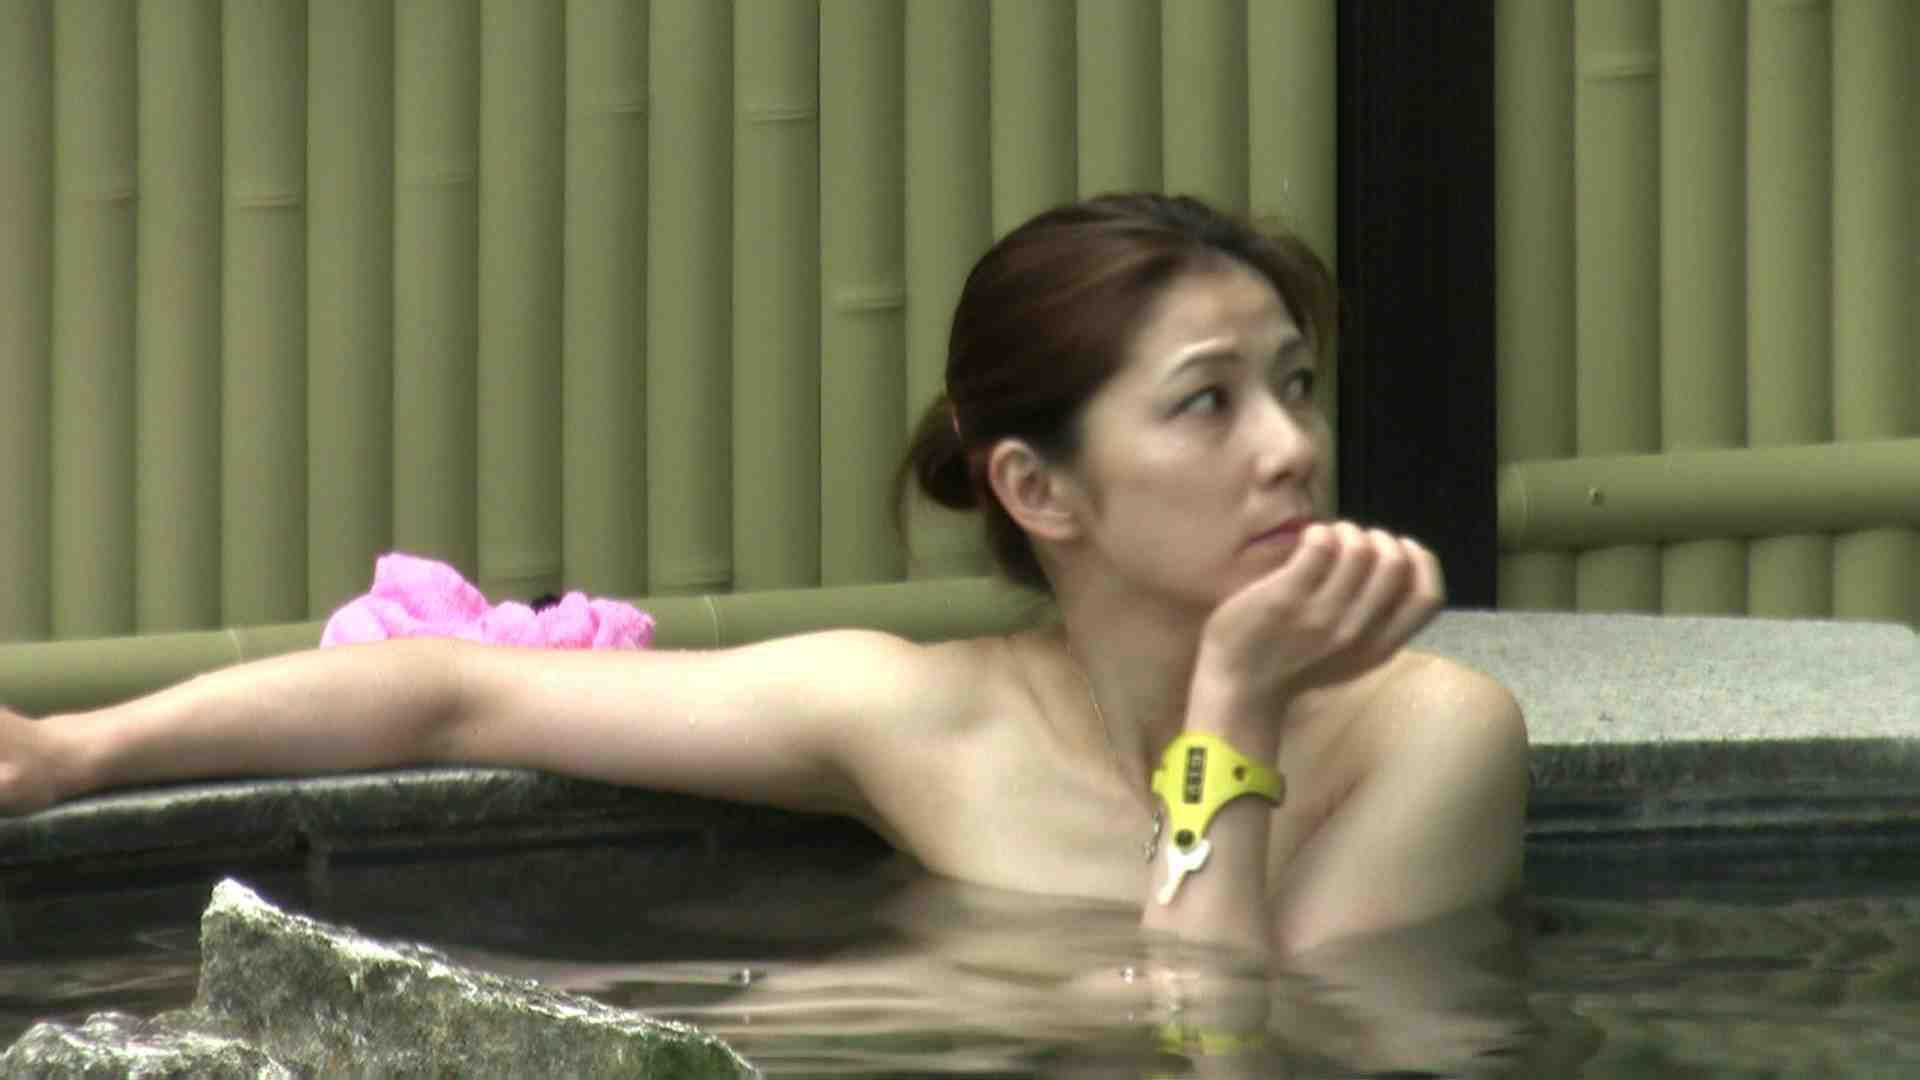 Aquaな露天風呂Vol.660 露天  59連発 24